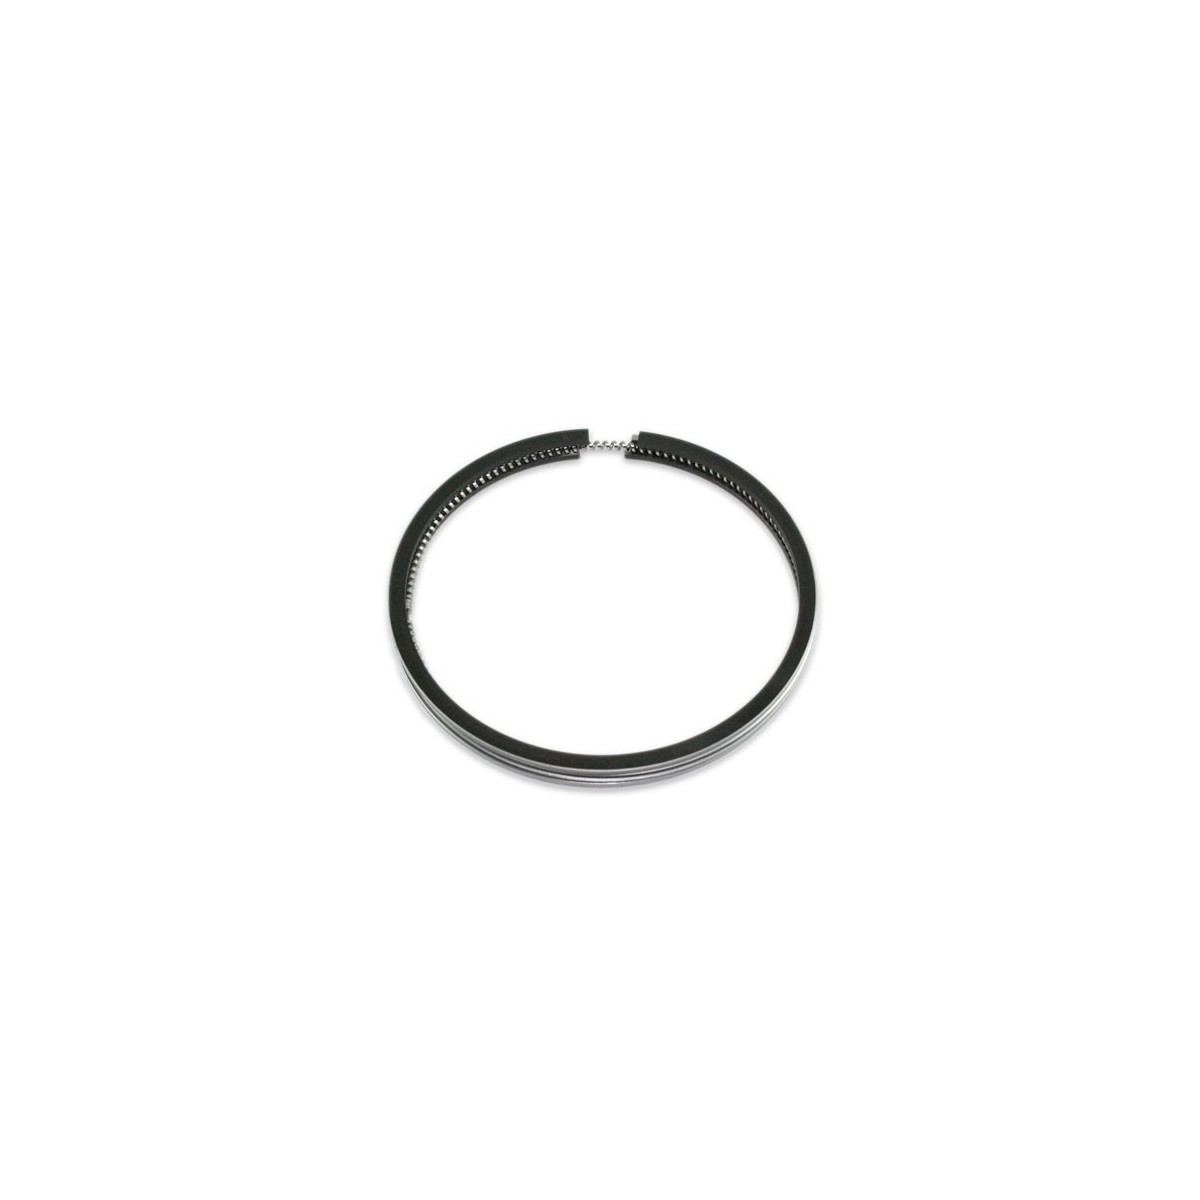 Piston Ring Set Kubota M9000 98mm 2x2x4mm